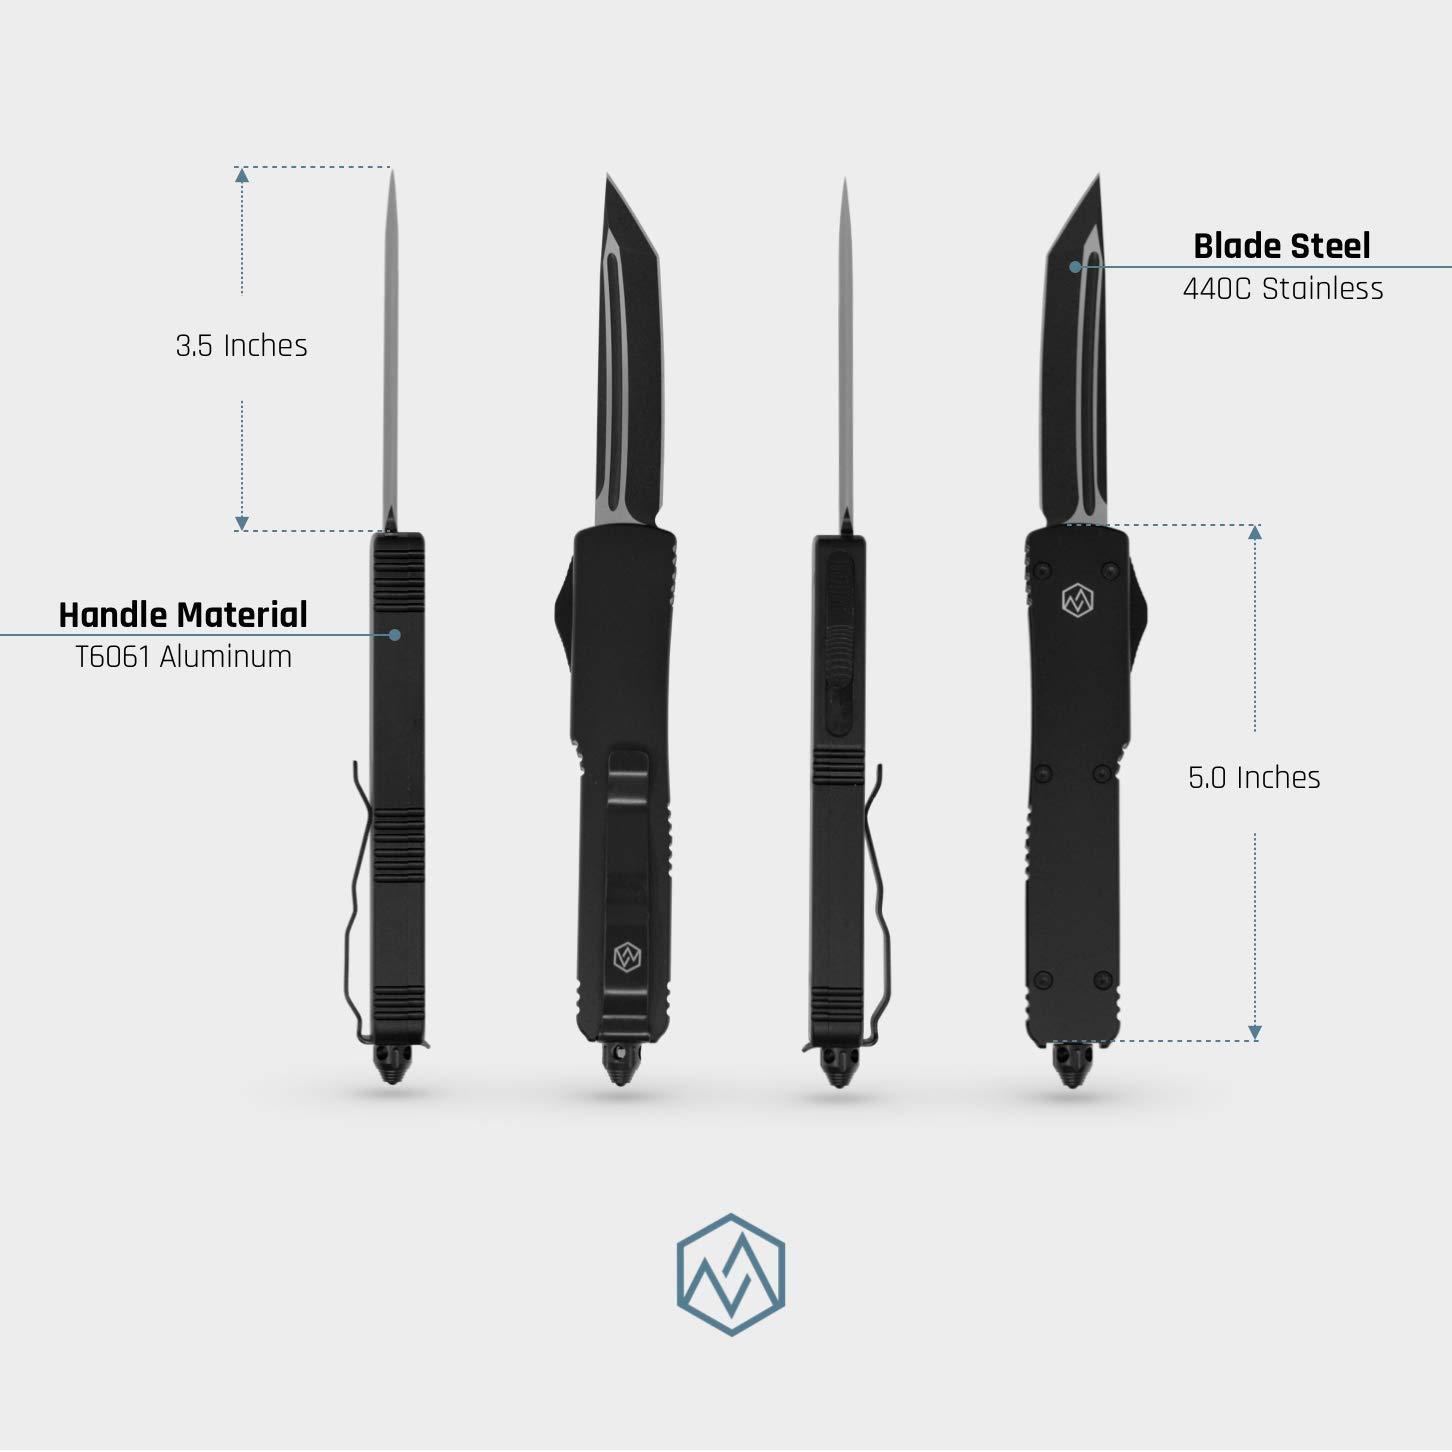 OTF Double Action Safety Knife (Matte Black & Black Tanto Blade) by OTF (Image #3)